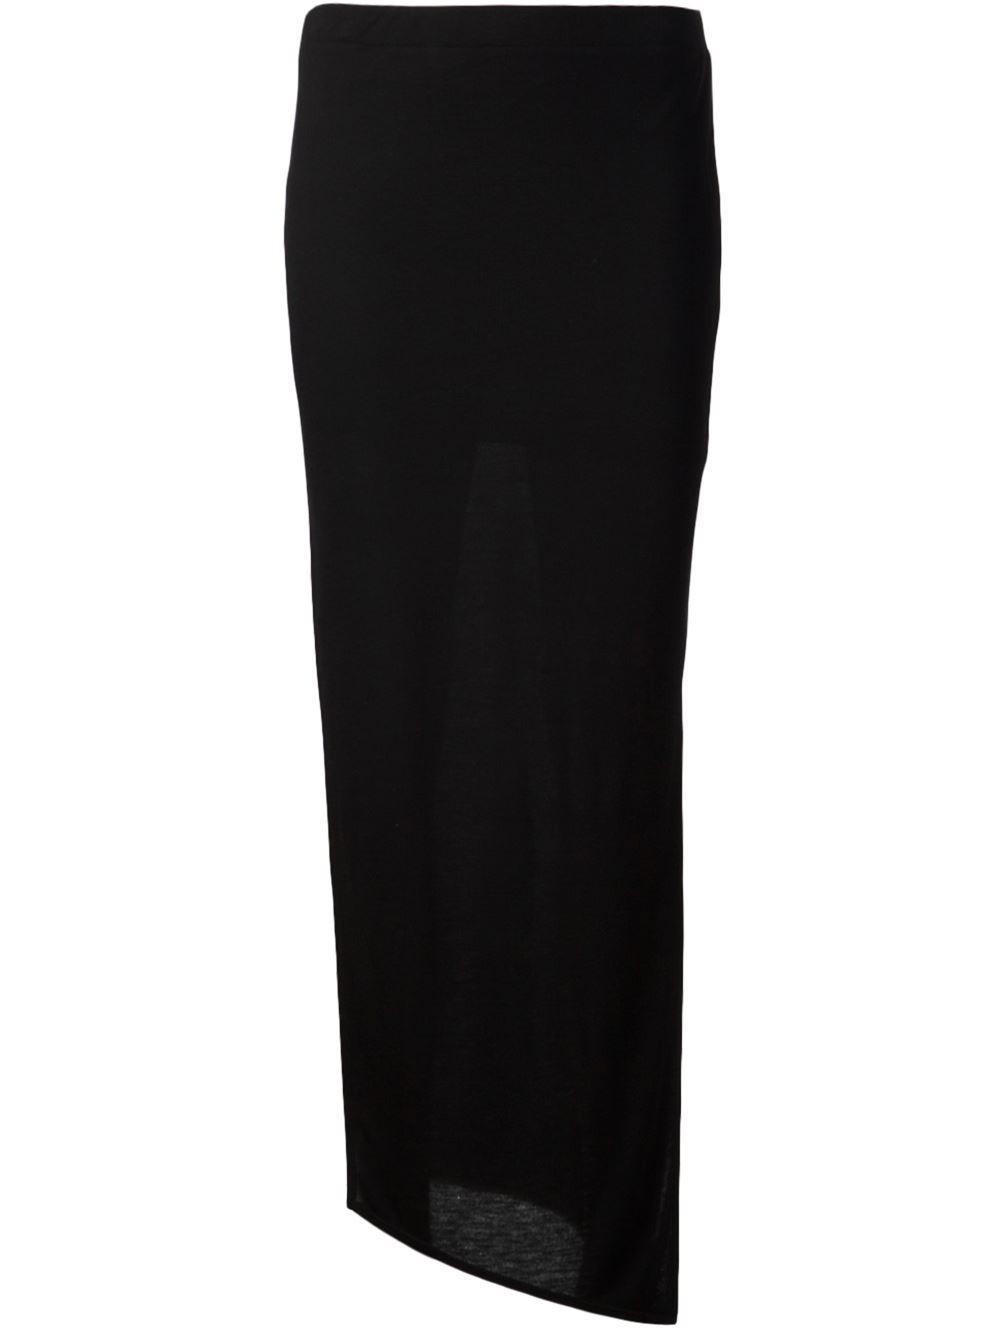 Helmut Lang Draped Skirt - Smets - Farfetch.com